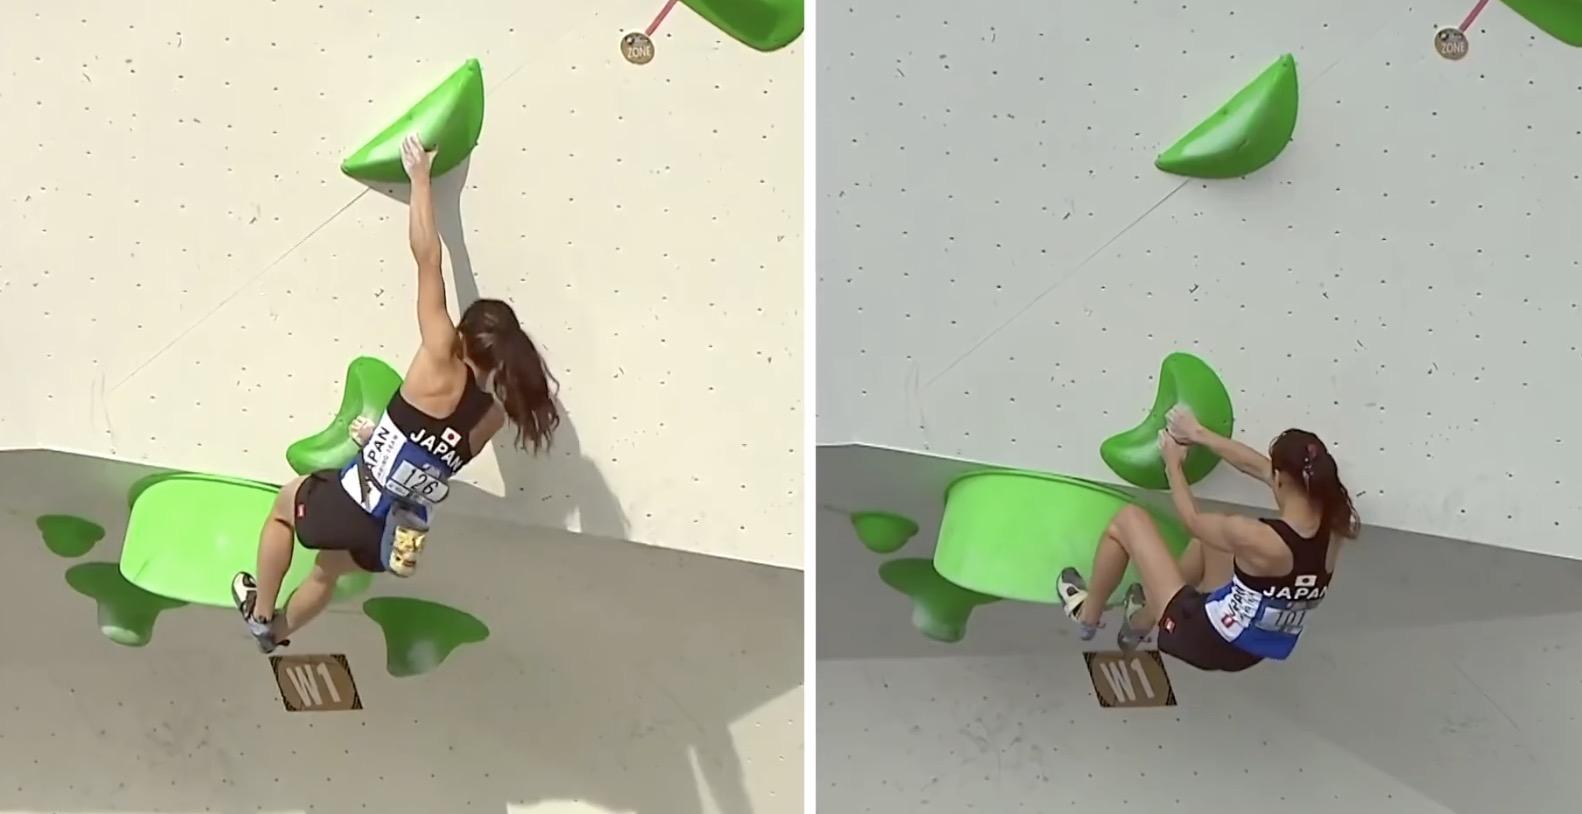 Watch climber Akiyo Noguchi crawl across the ceiling